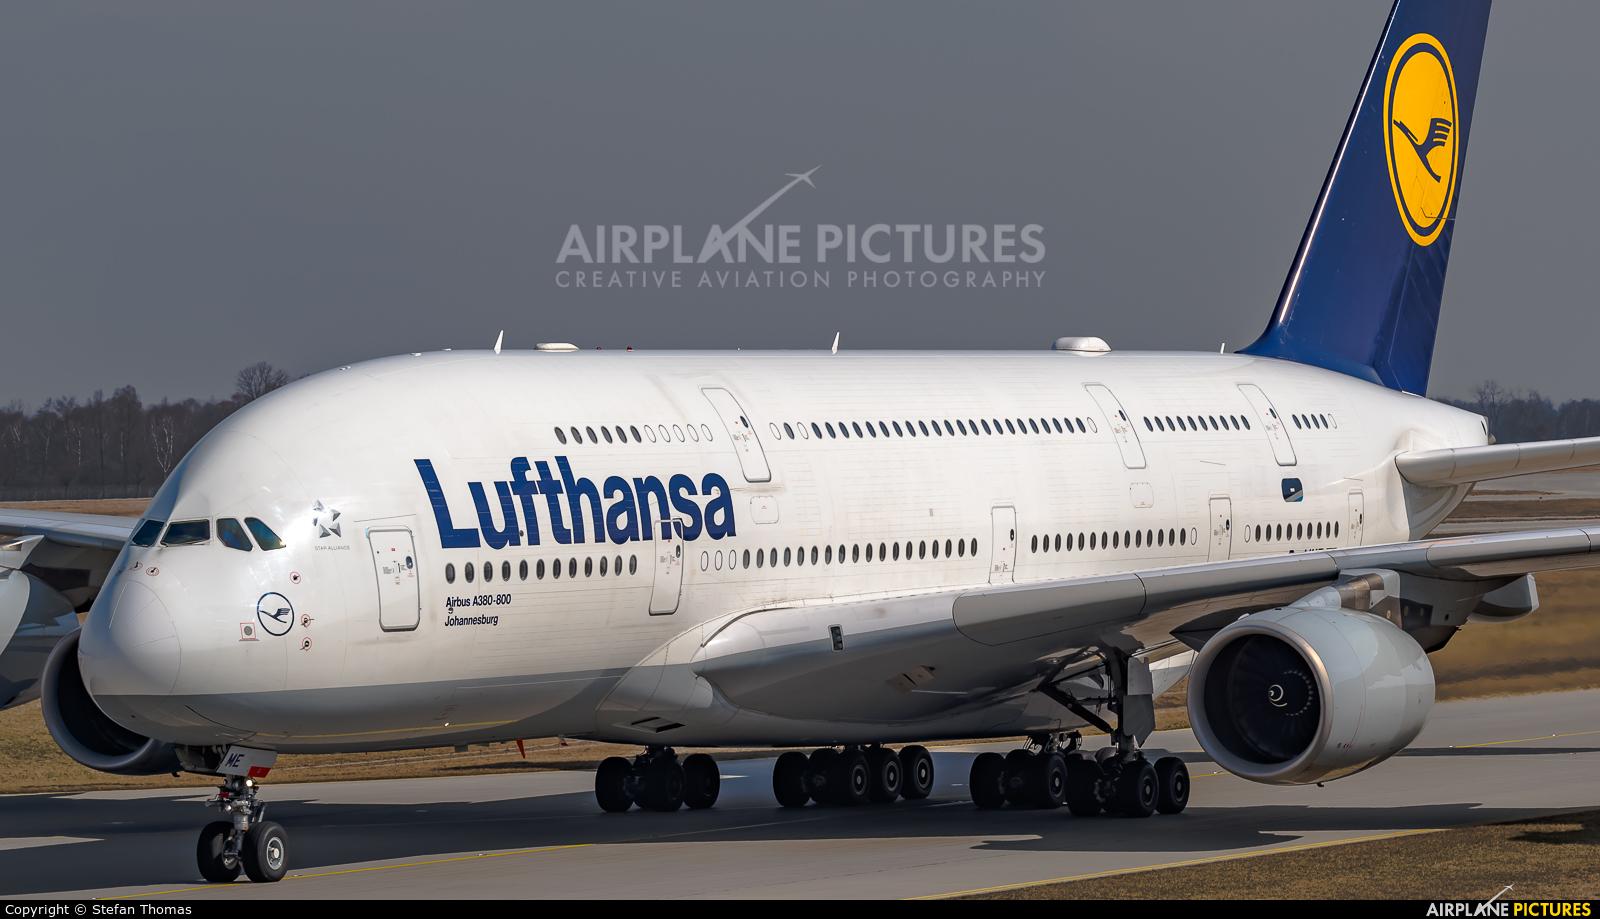 Lufthansa D-AIME aircraft at Munich